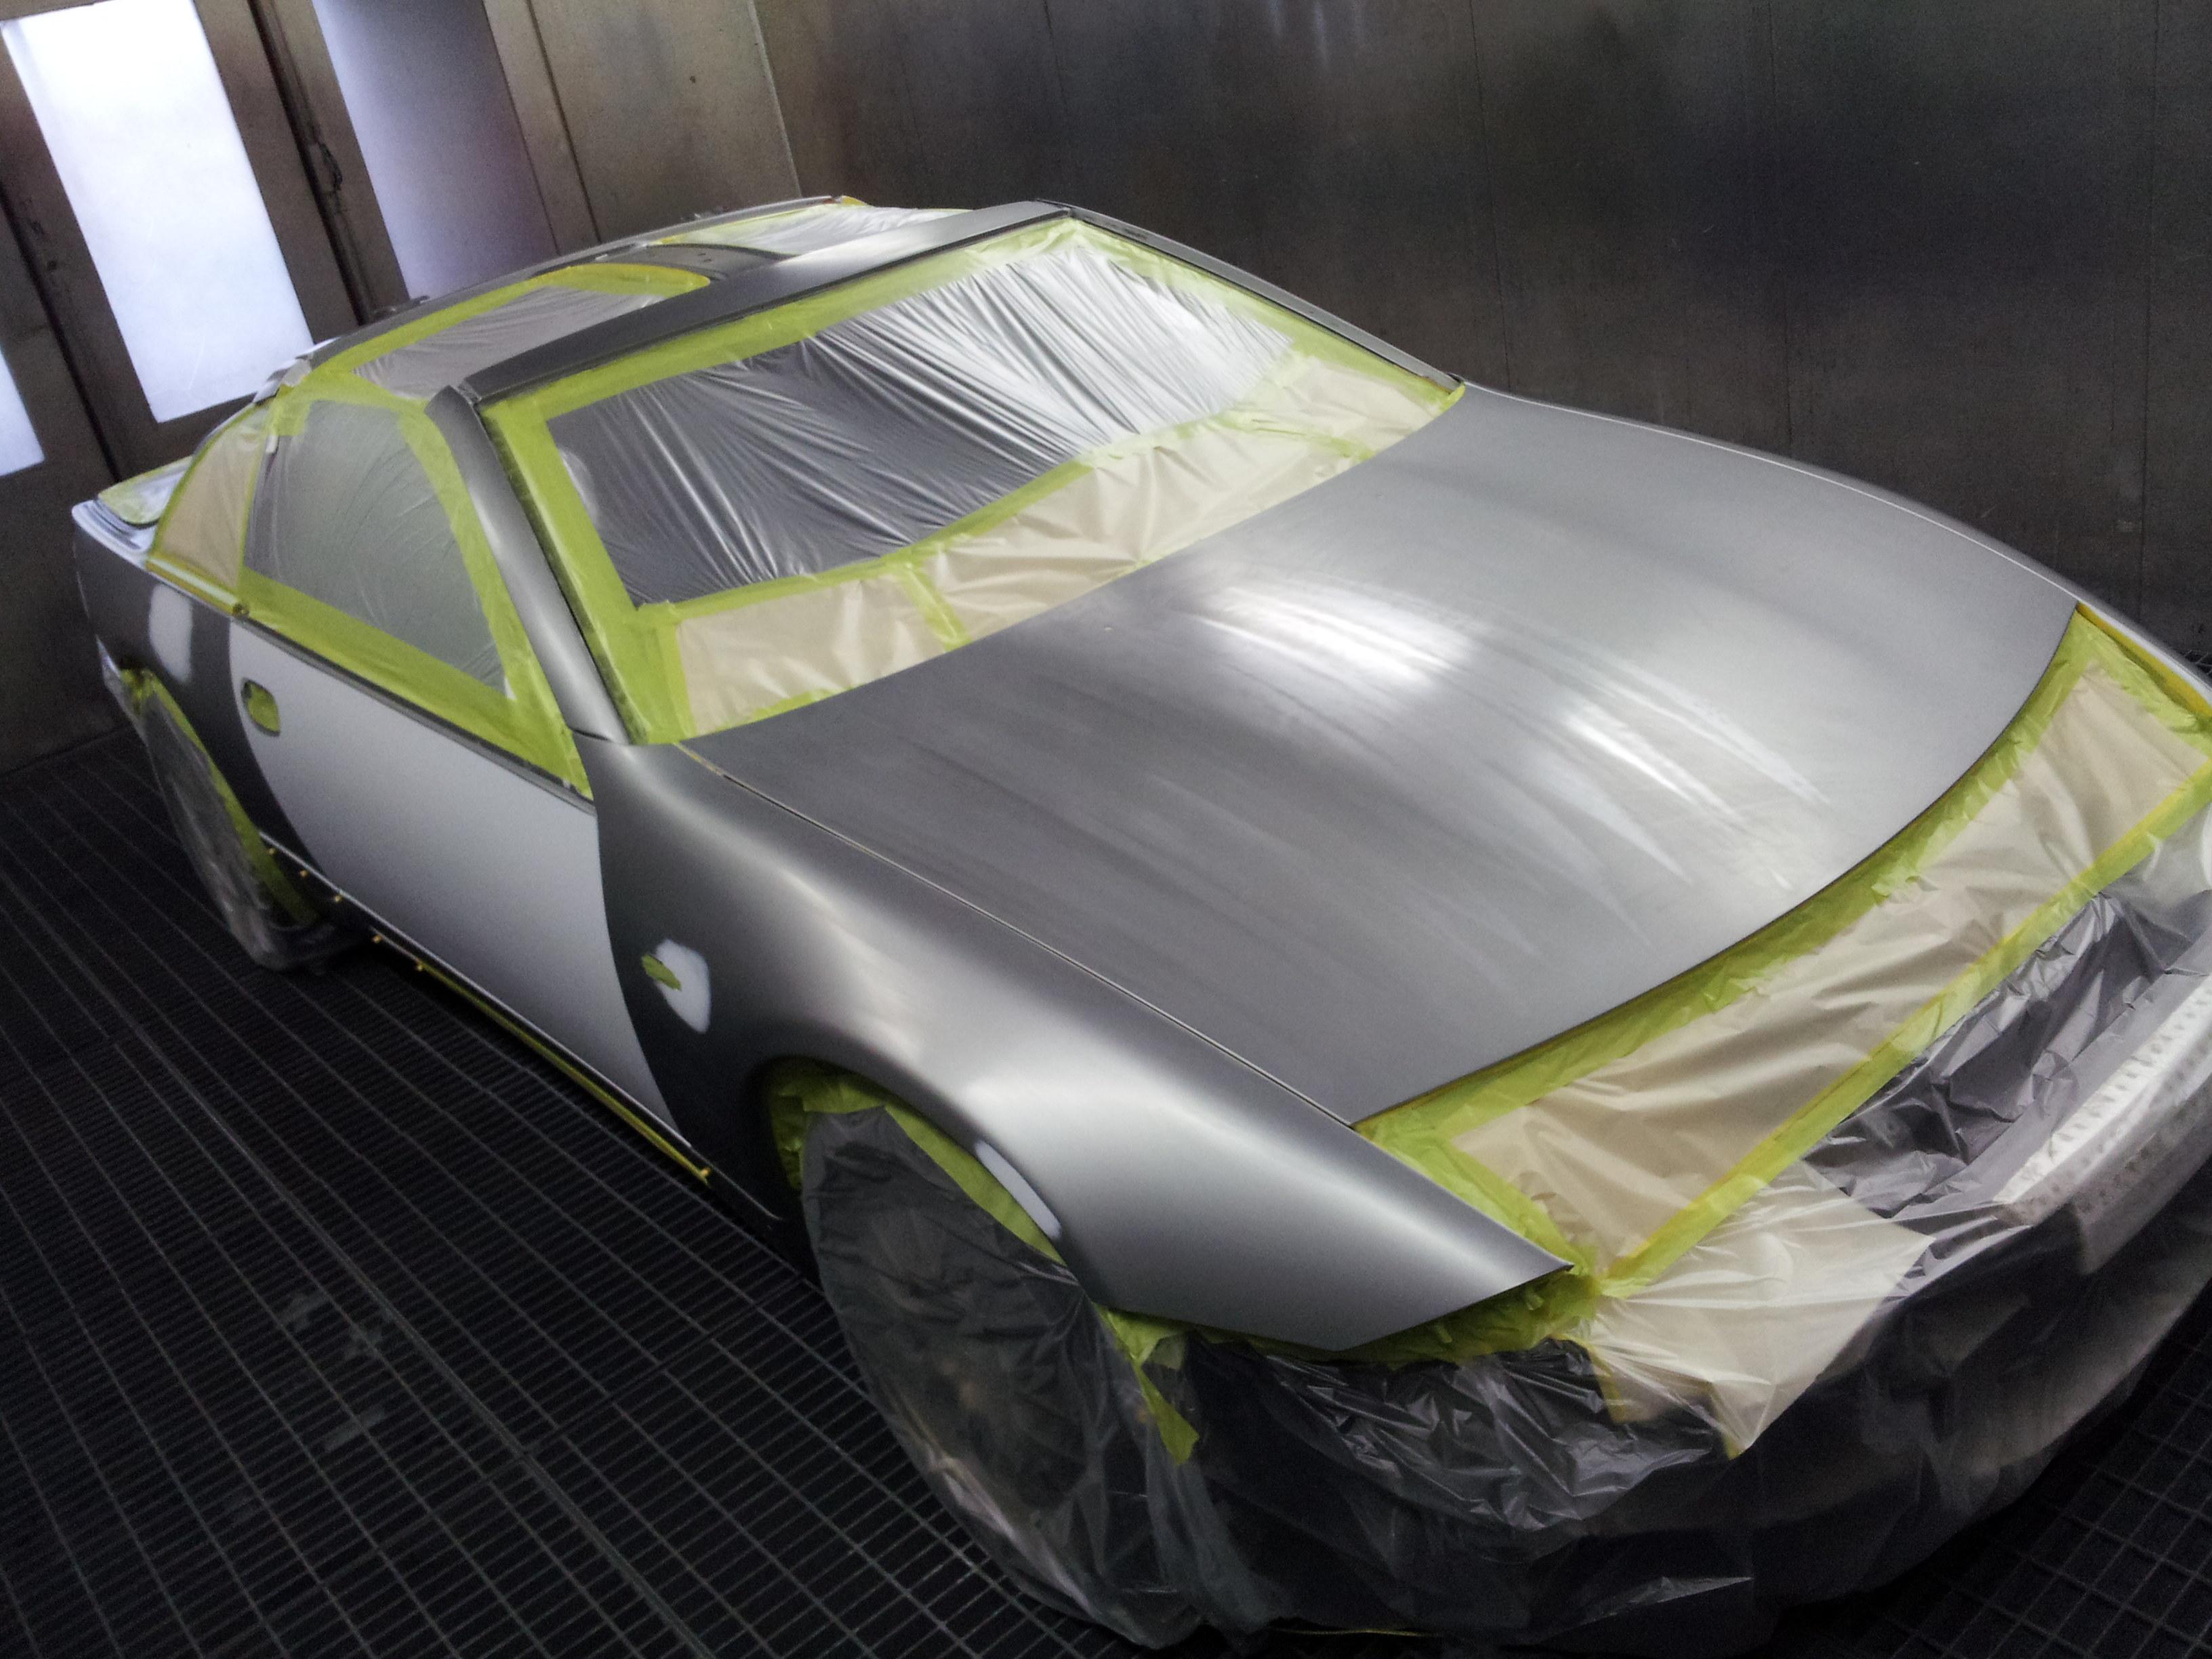 Z32 フェアレディZ 全塗装 色替え オールペイント NSXのパールホワイトにしました